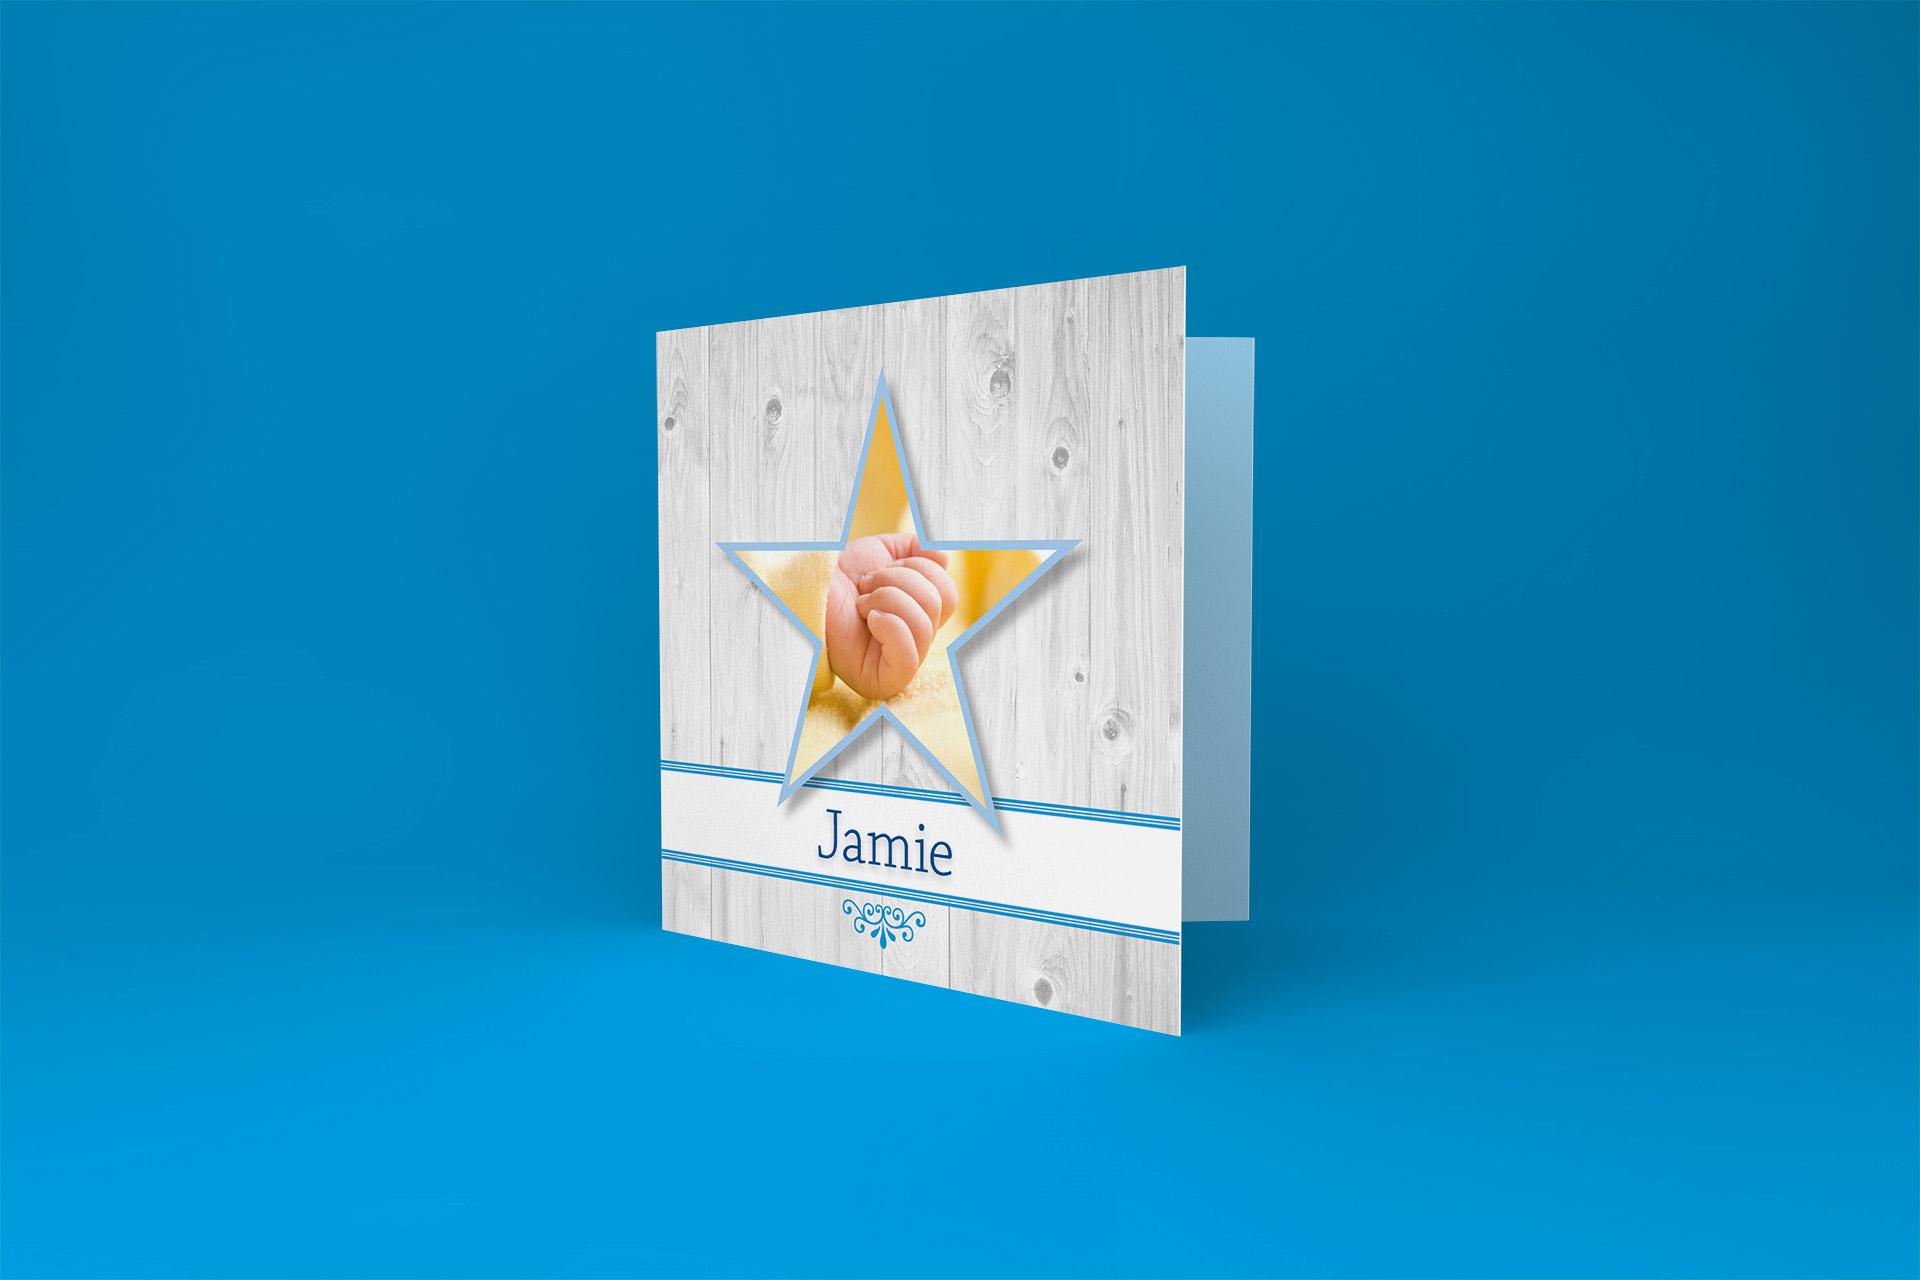 Babydesign geboortekaartje Jamie Photoshoot